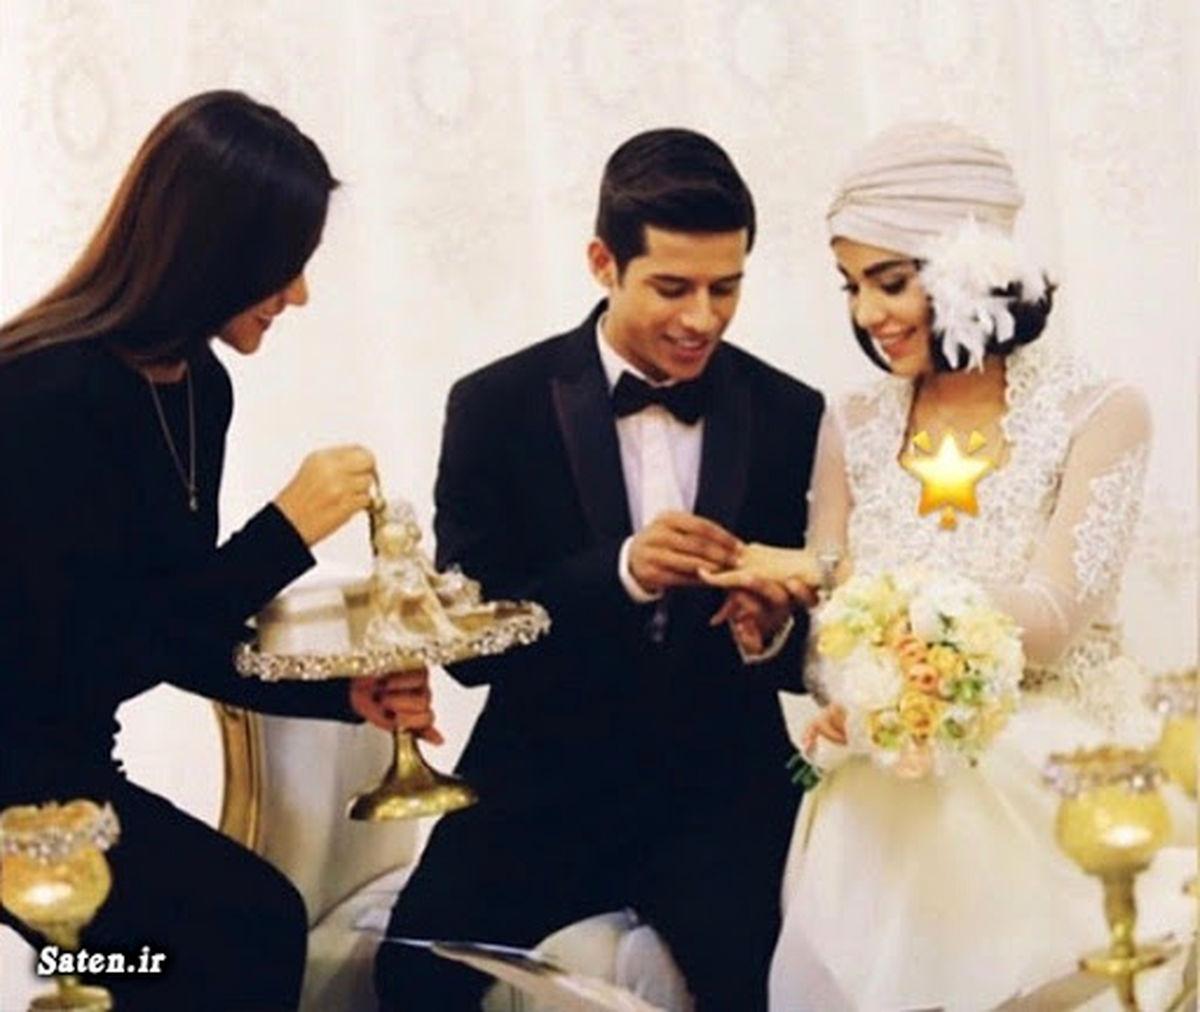 مهدی قائدی و همسرش در مهمانی  روی کشتی + عکس